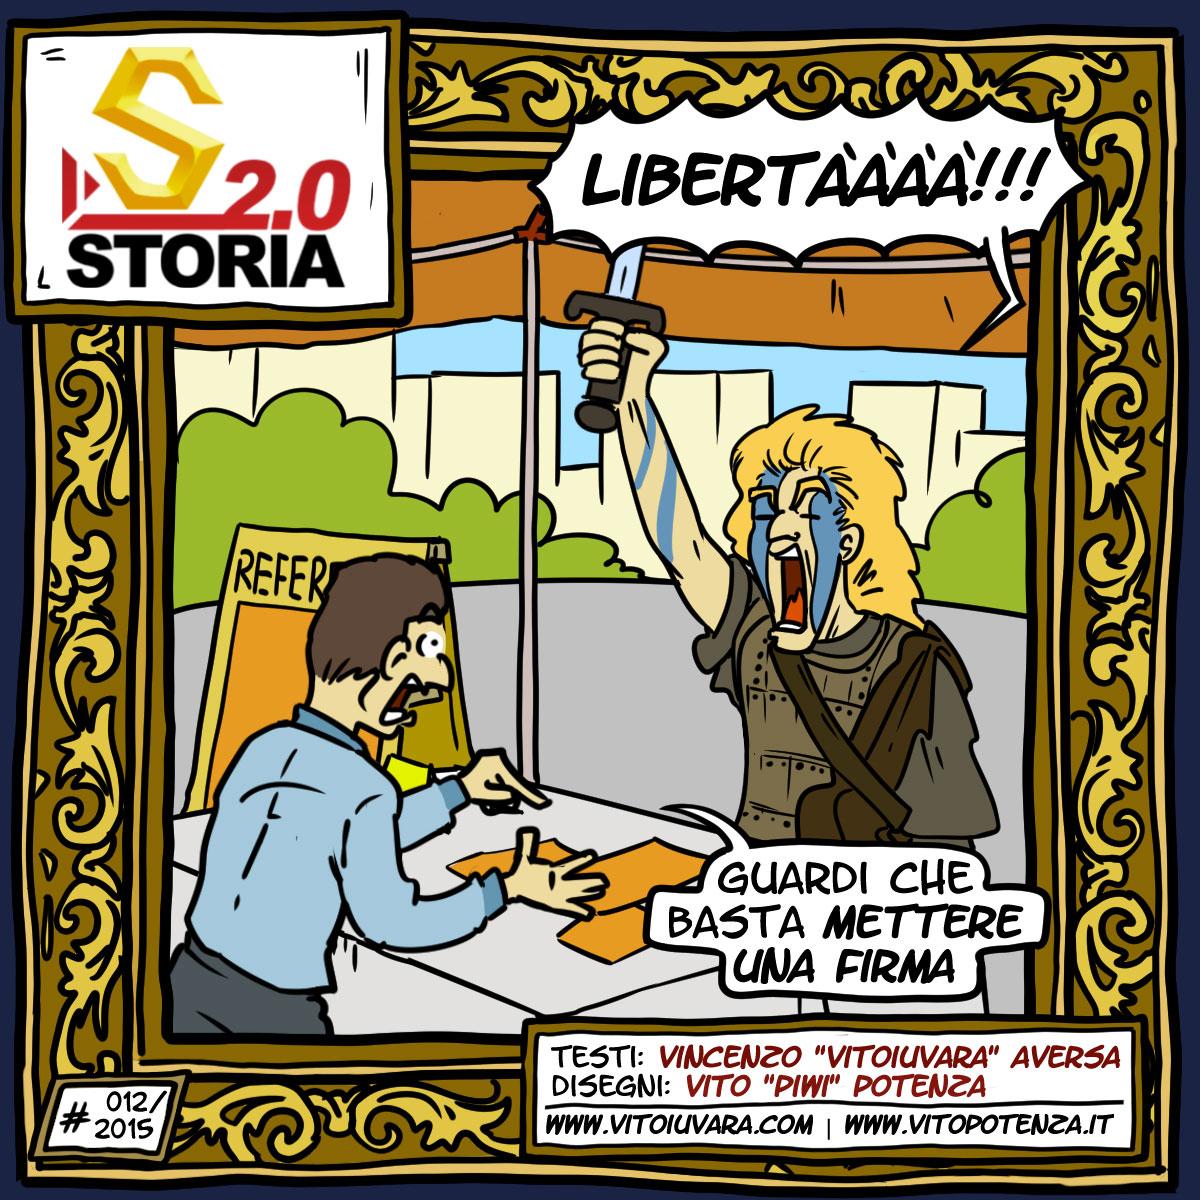 Storia 2.0: Vignette 11-14